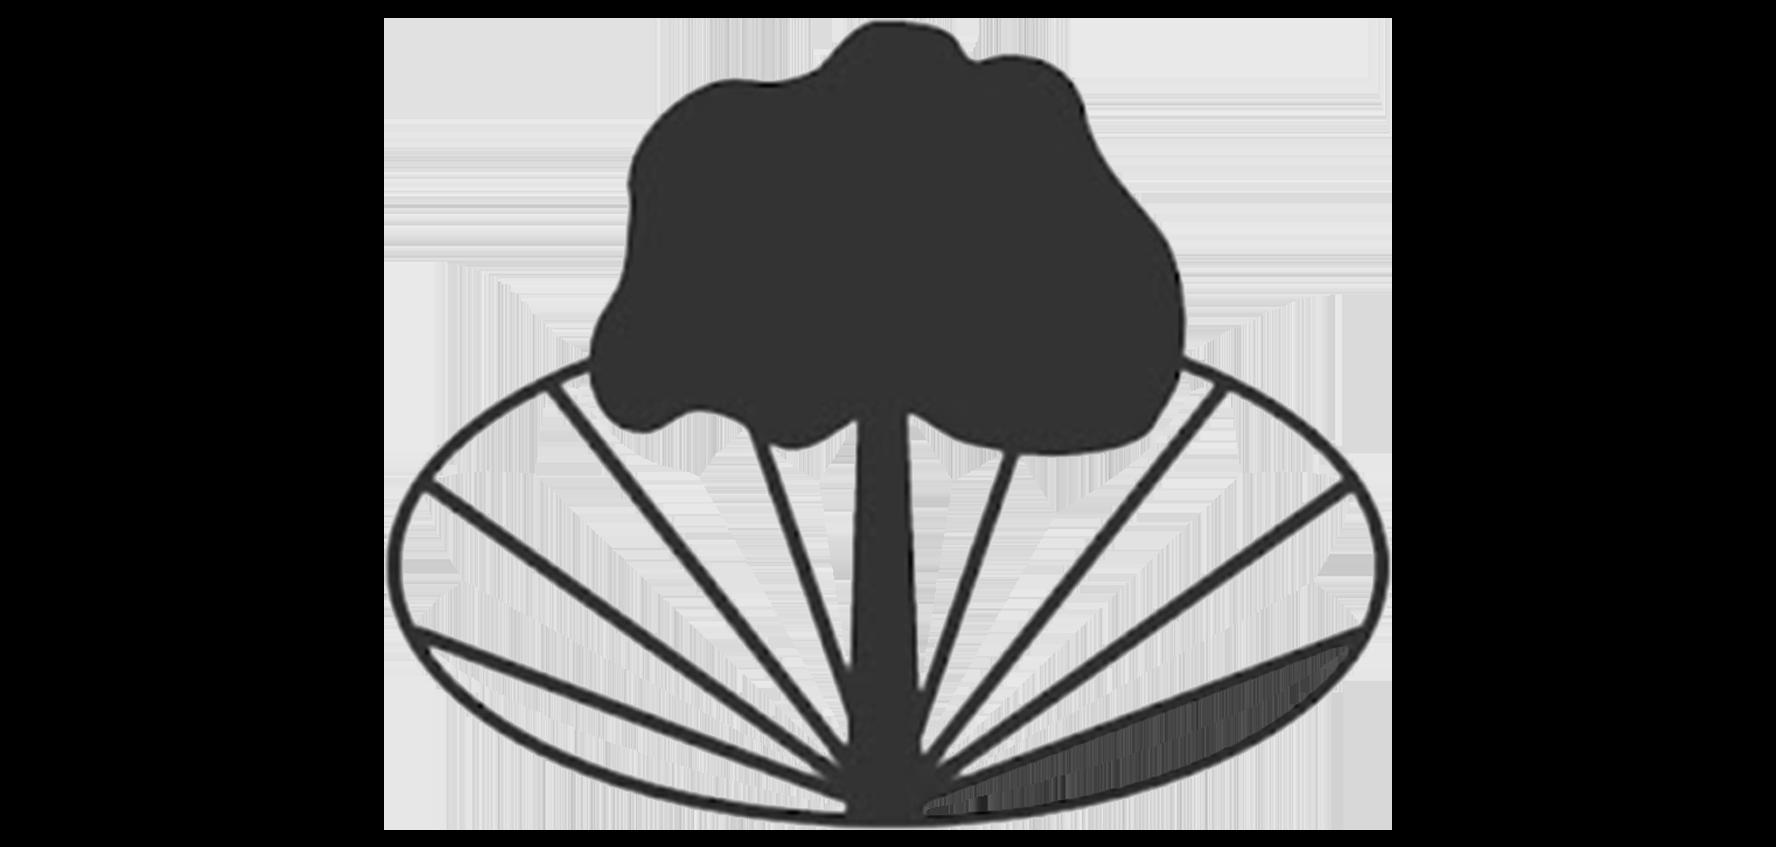 stocklandgreen